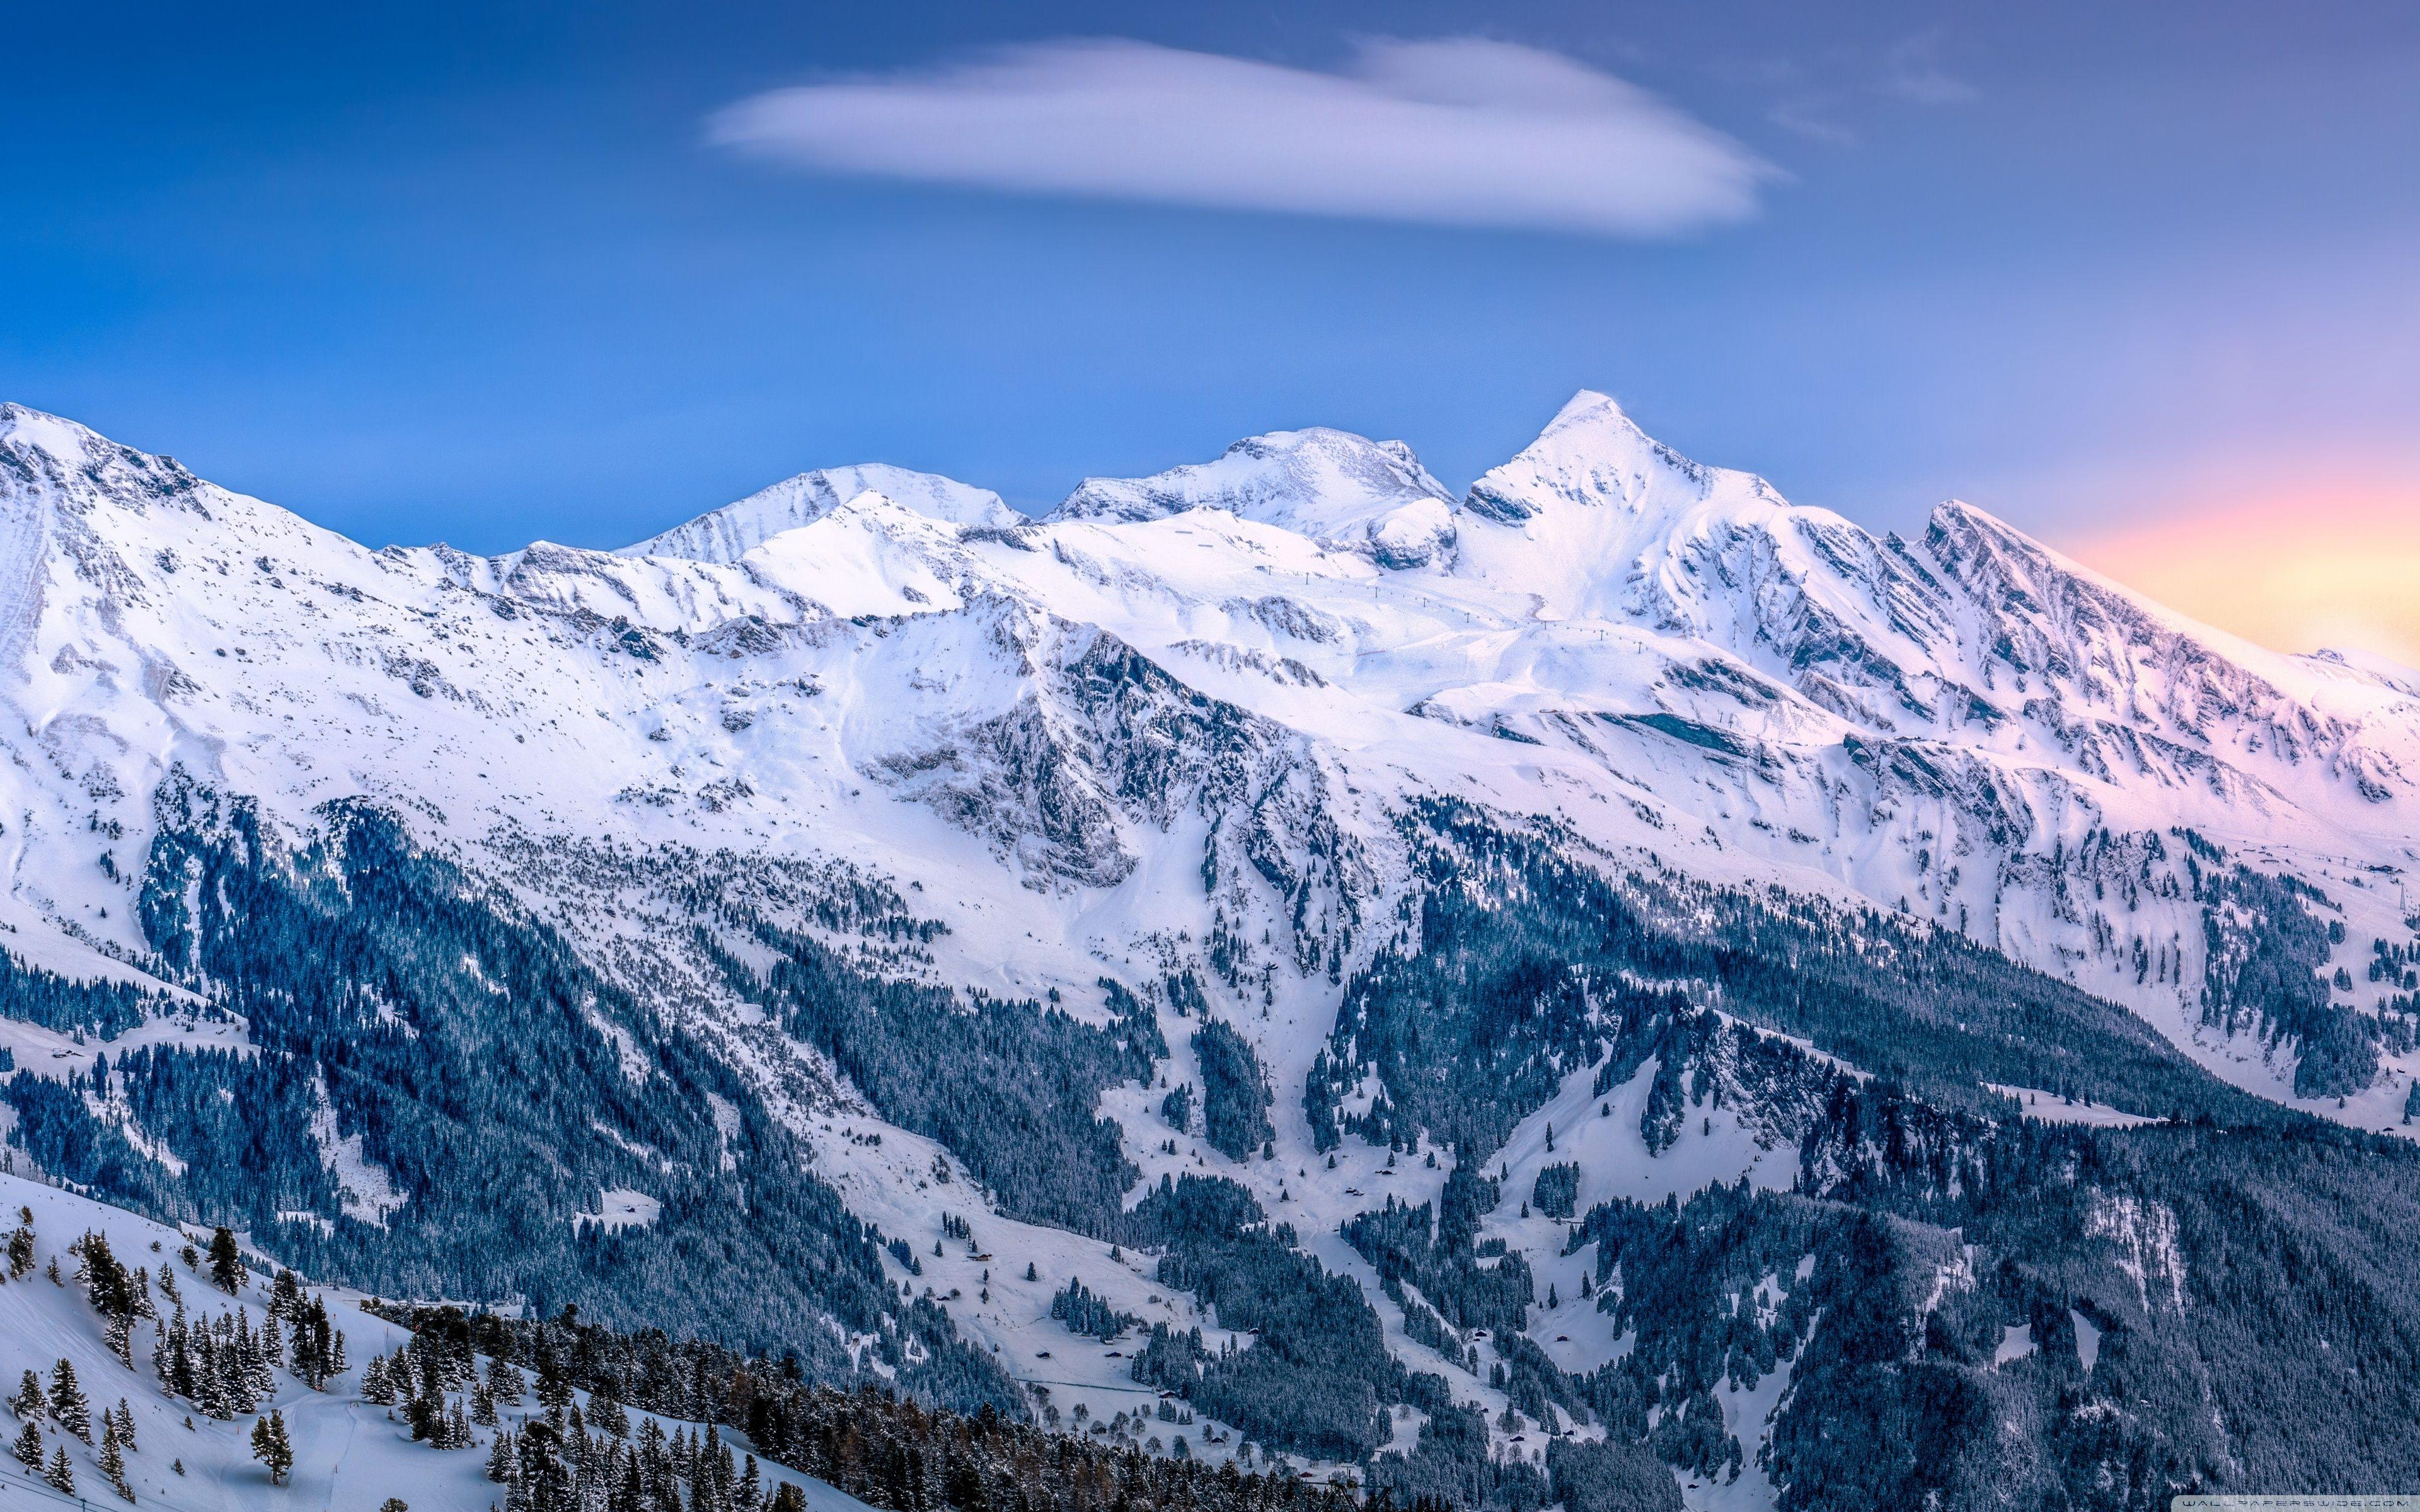 Ski Slope Wallpapers   Top Ski Slope Backgrounds 3840x2400